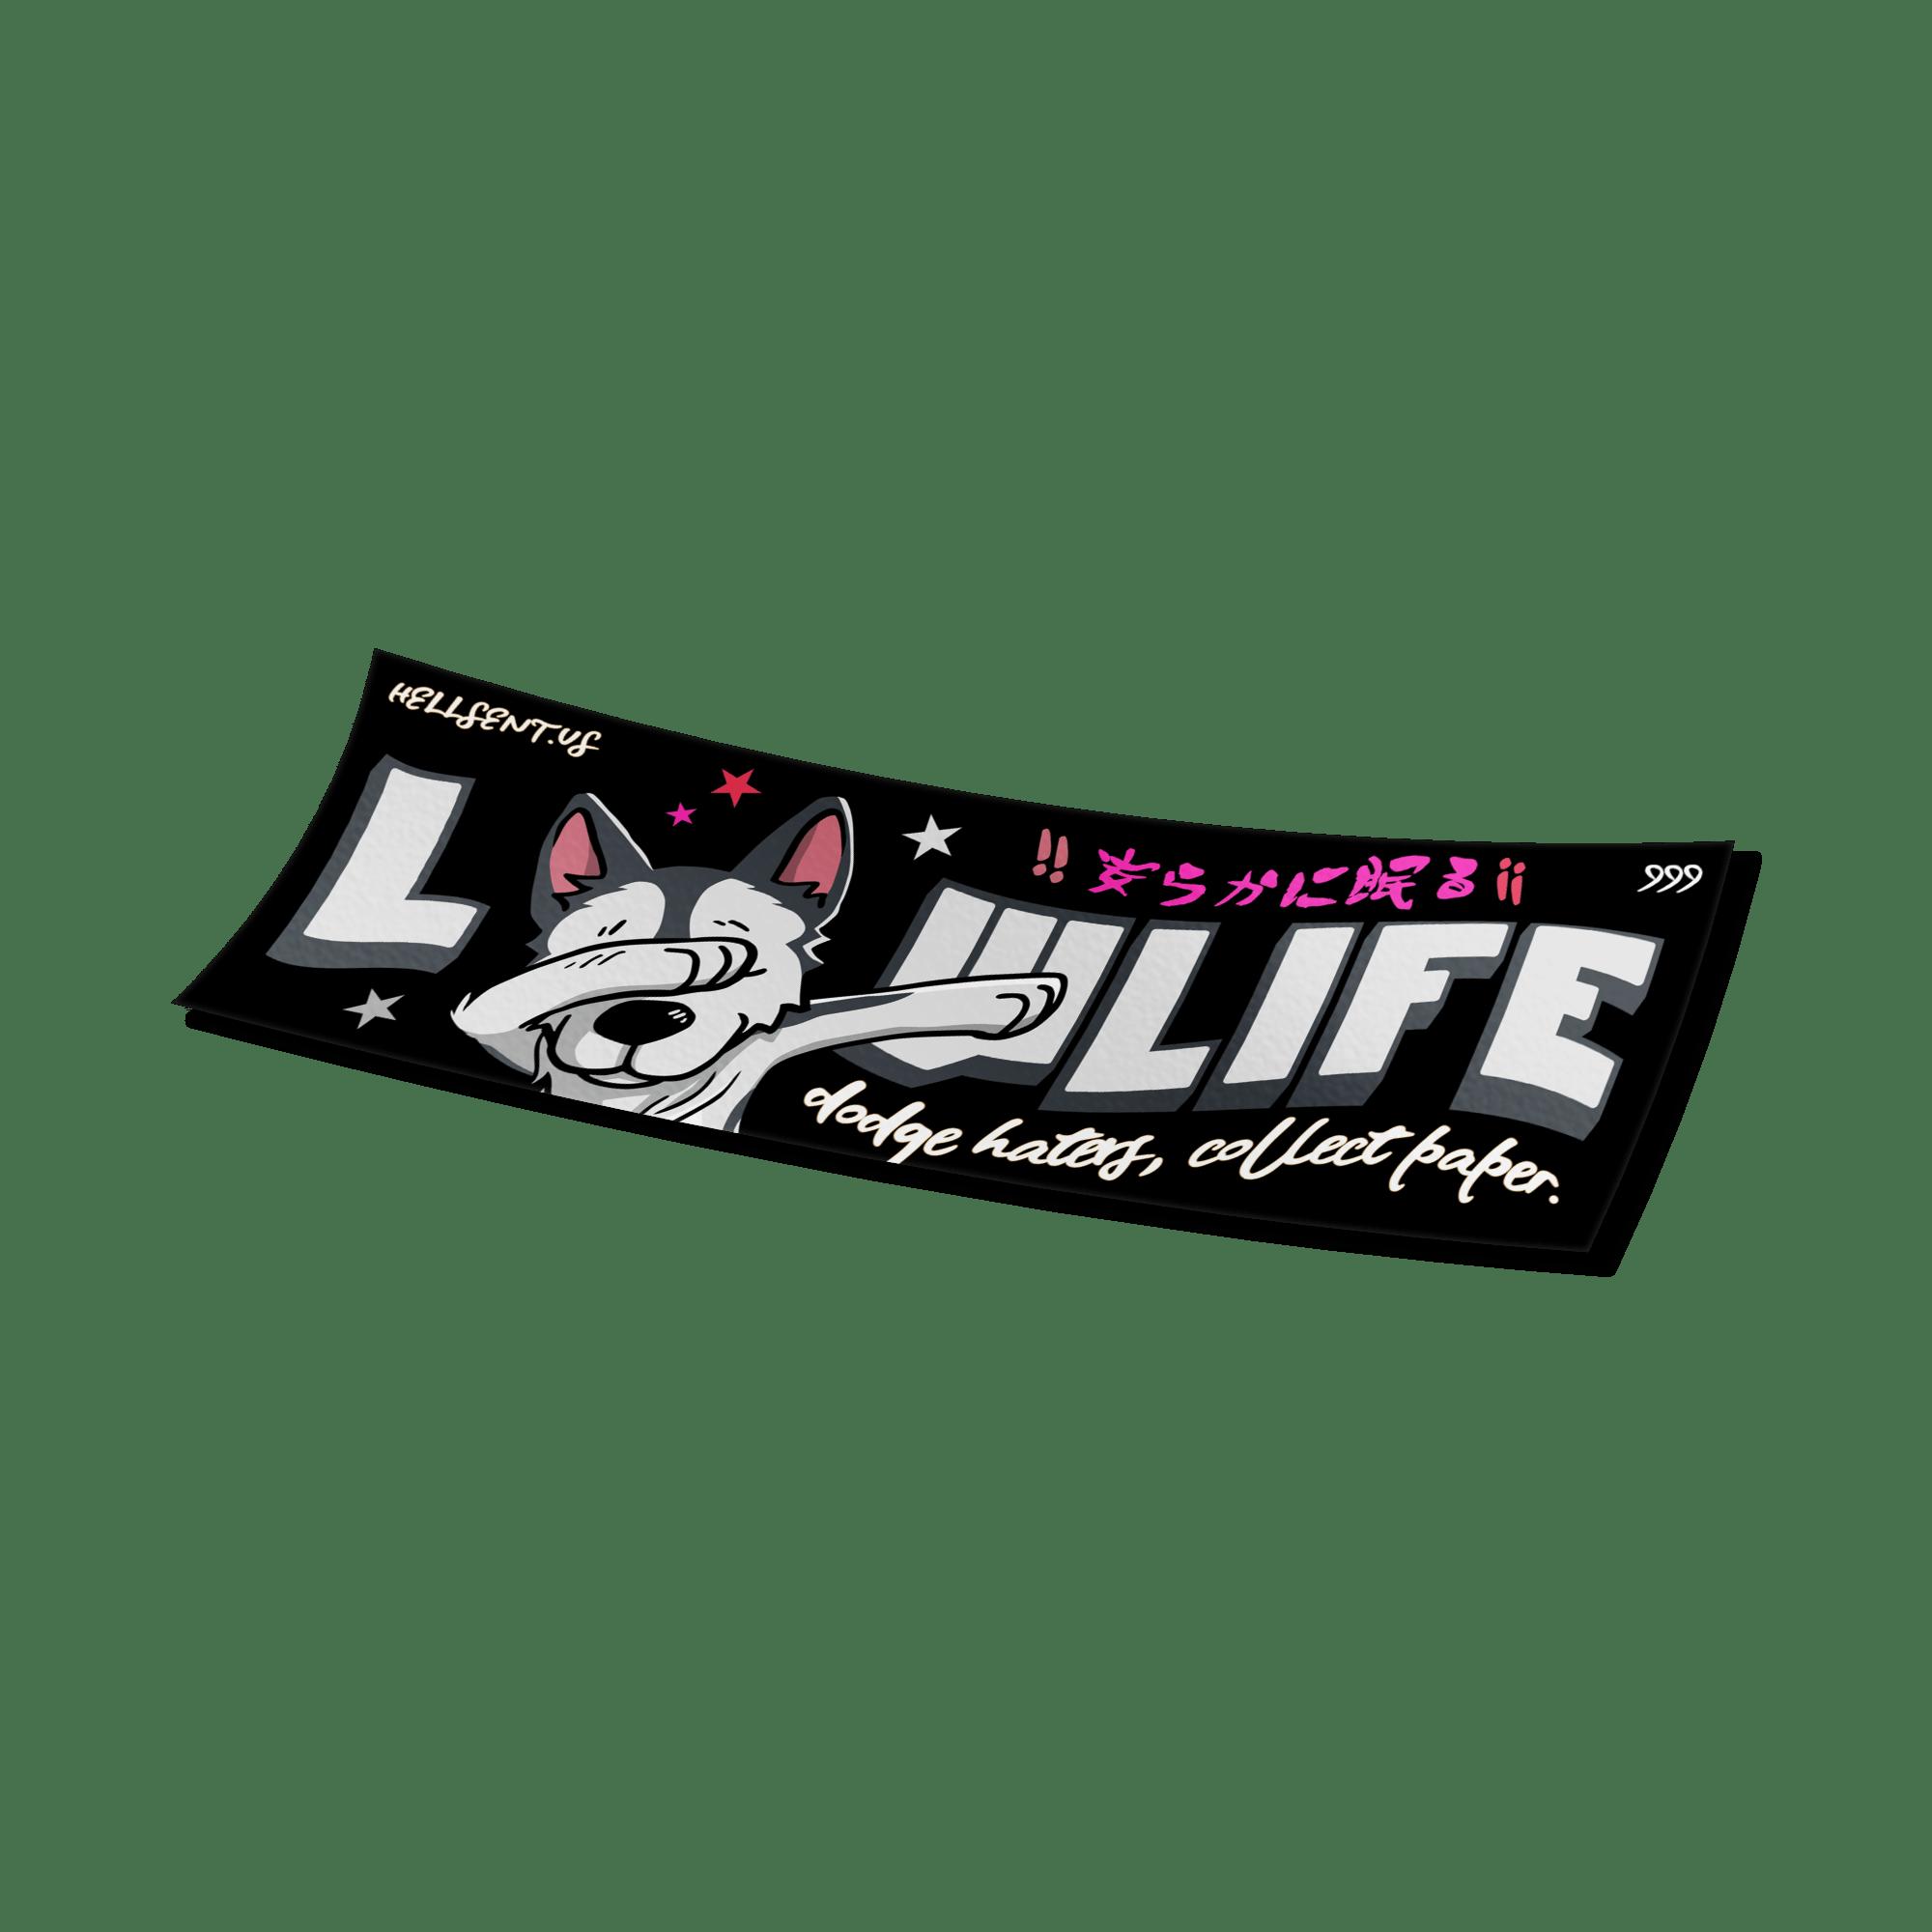 Image of Lowlife V2